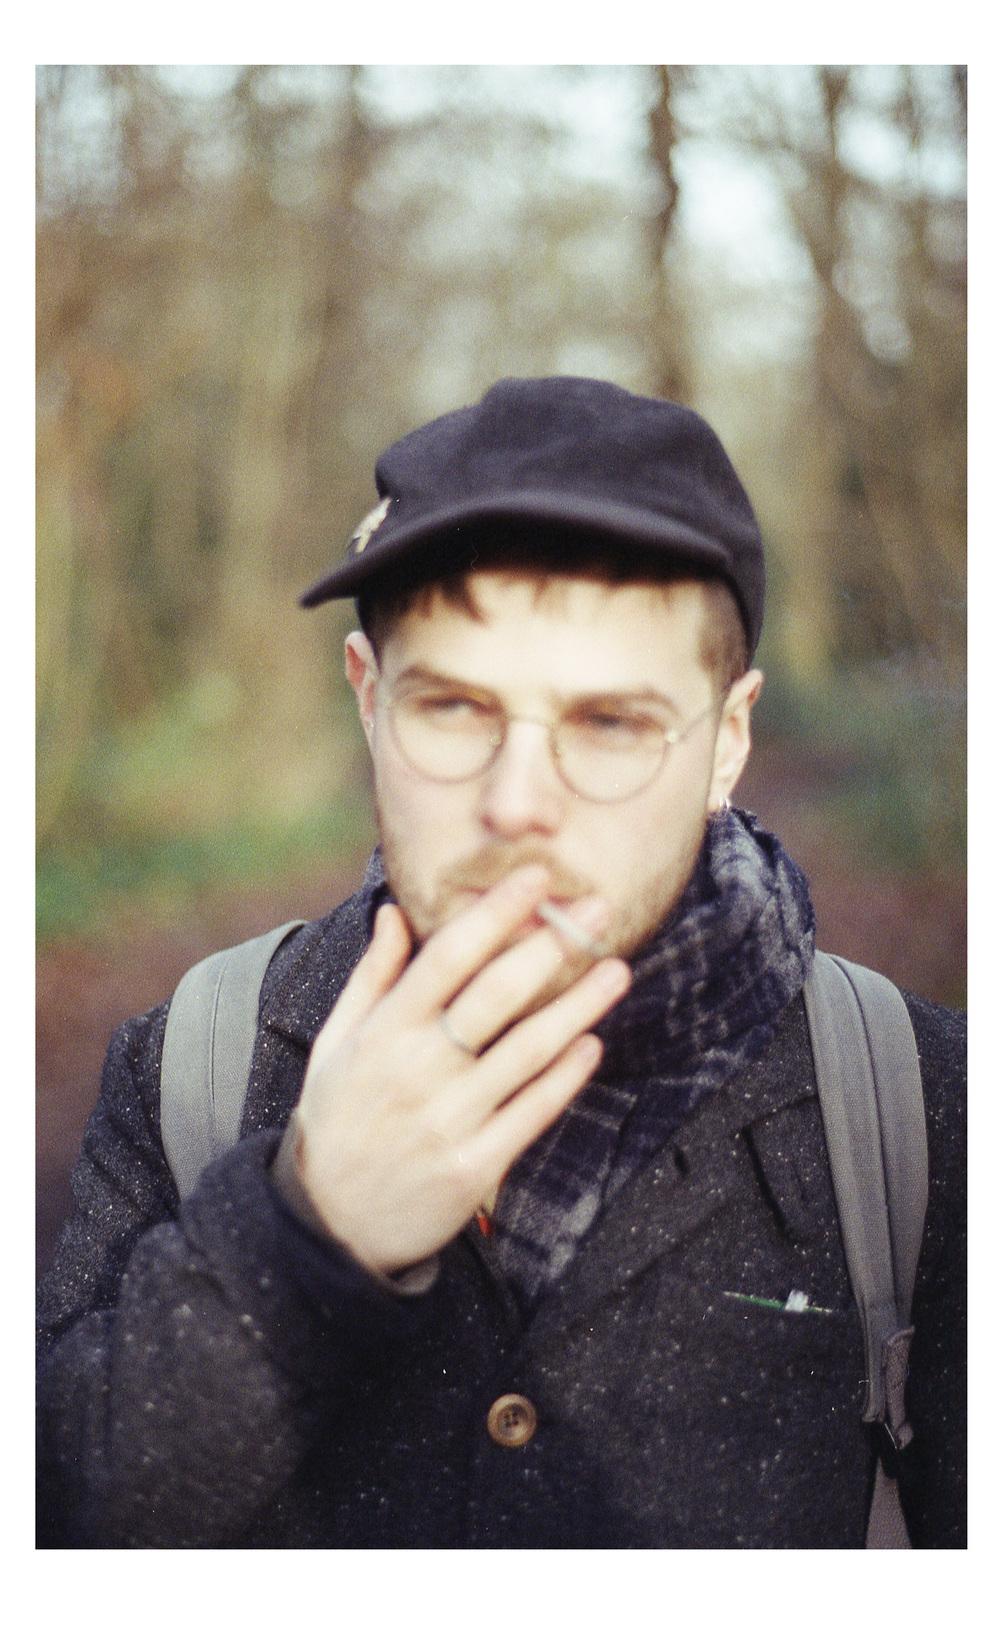 2014-KodakGB200-35-Jan-018-b-300.jpg